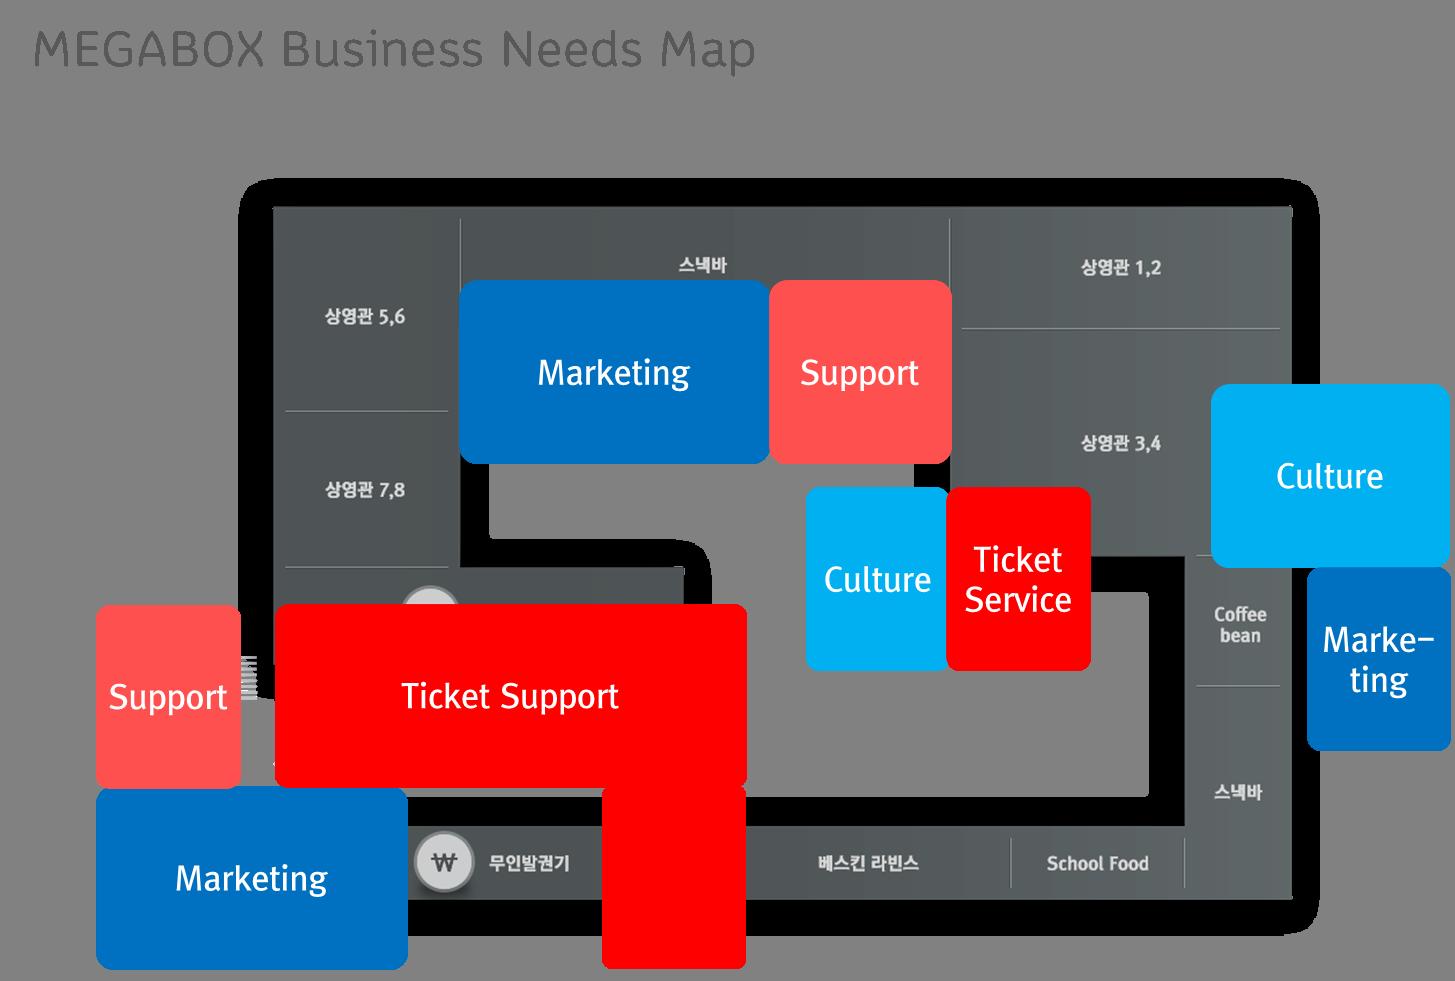 MEGABOX Business Needs Map